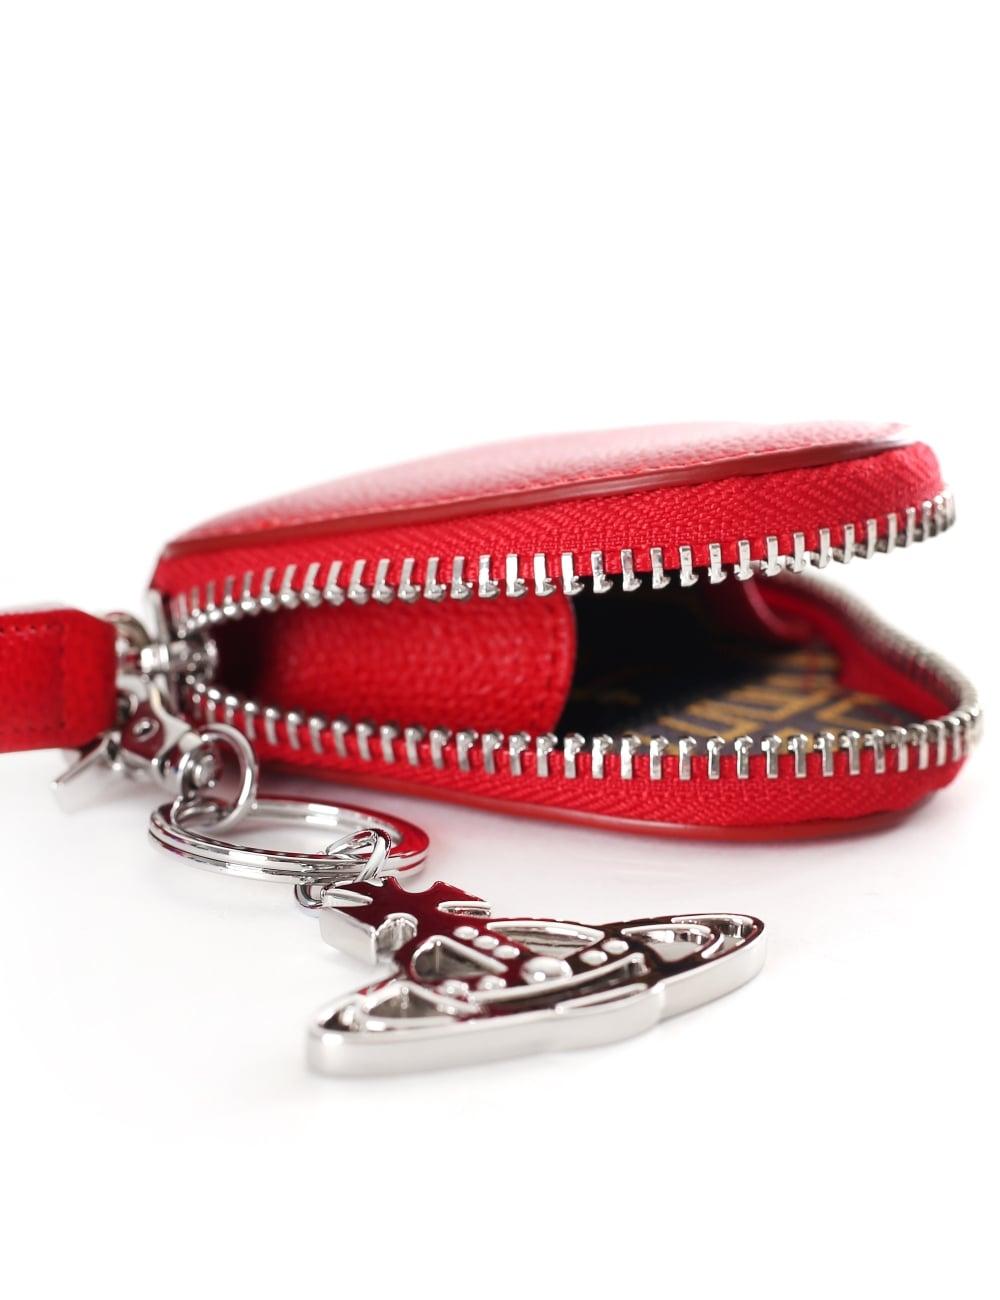 688895531d Vivienne Westwood Women's Johanna Heart Coin Case With Orb ...